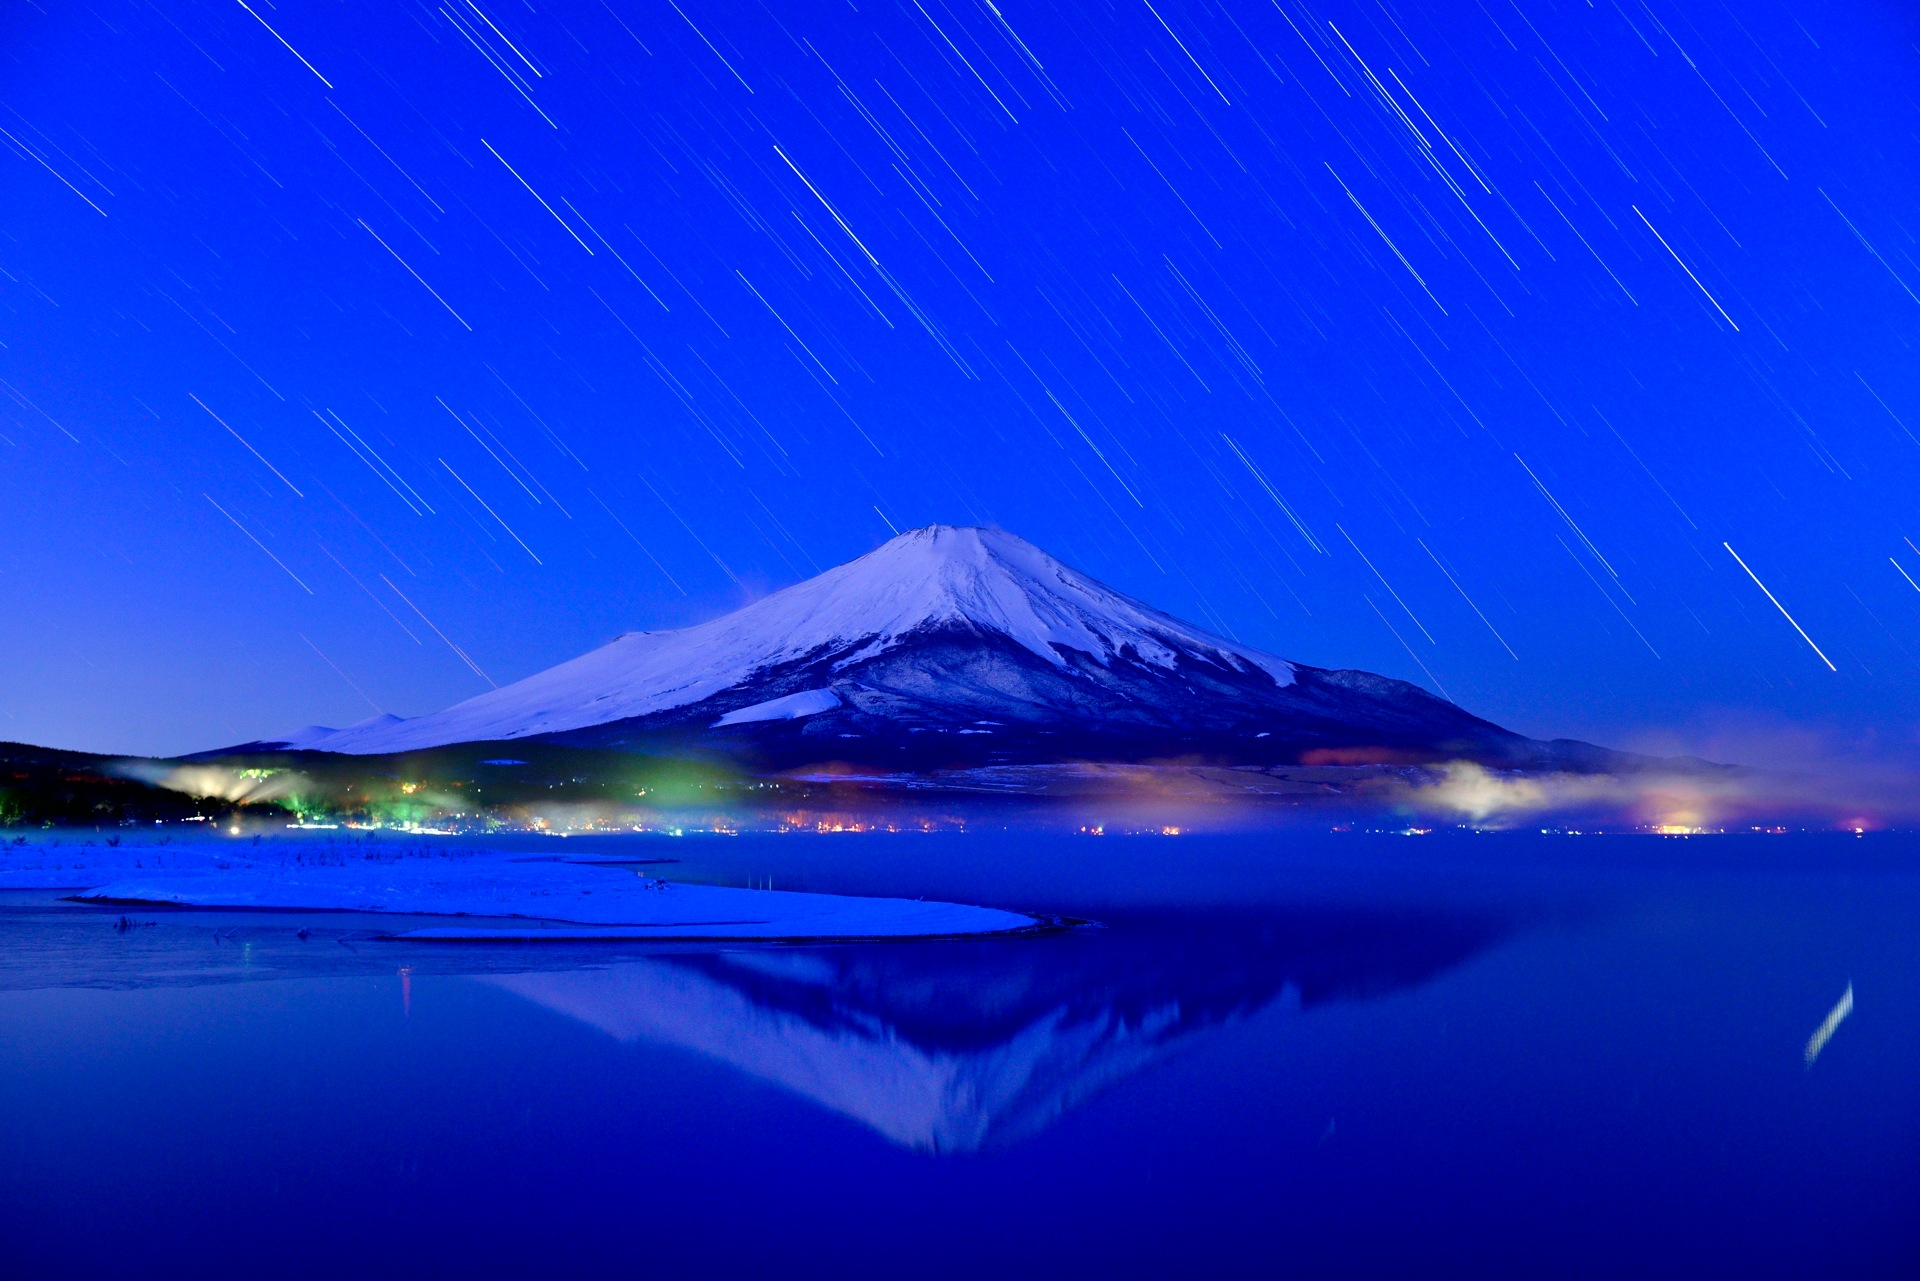 Mt.Fuji by Syuki Eita